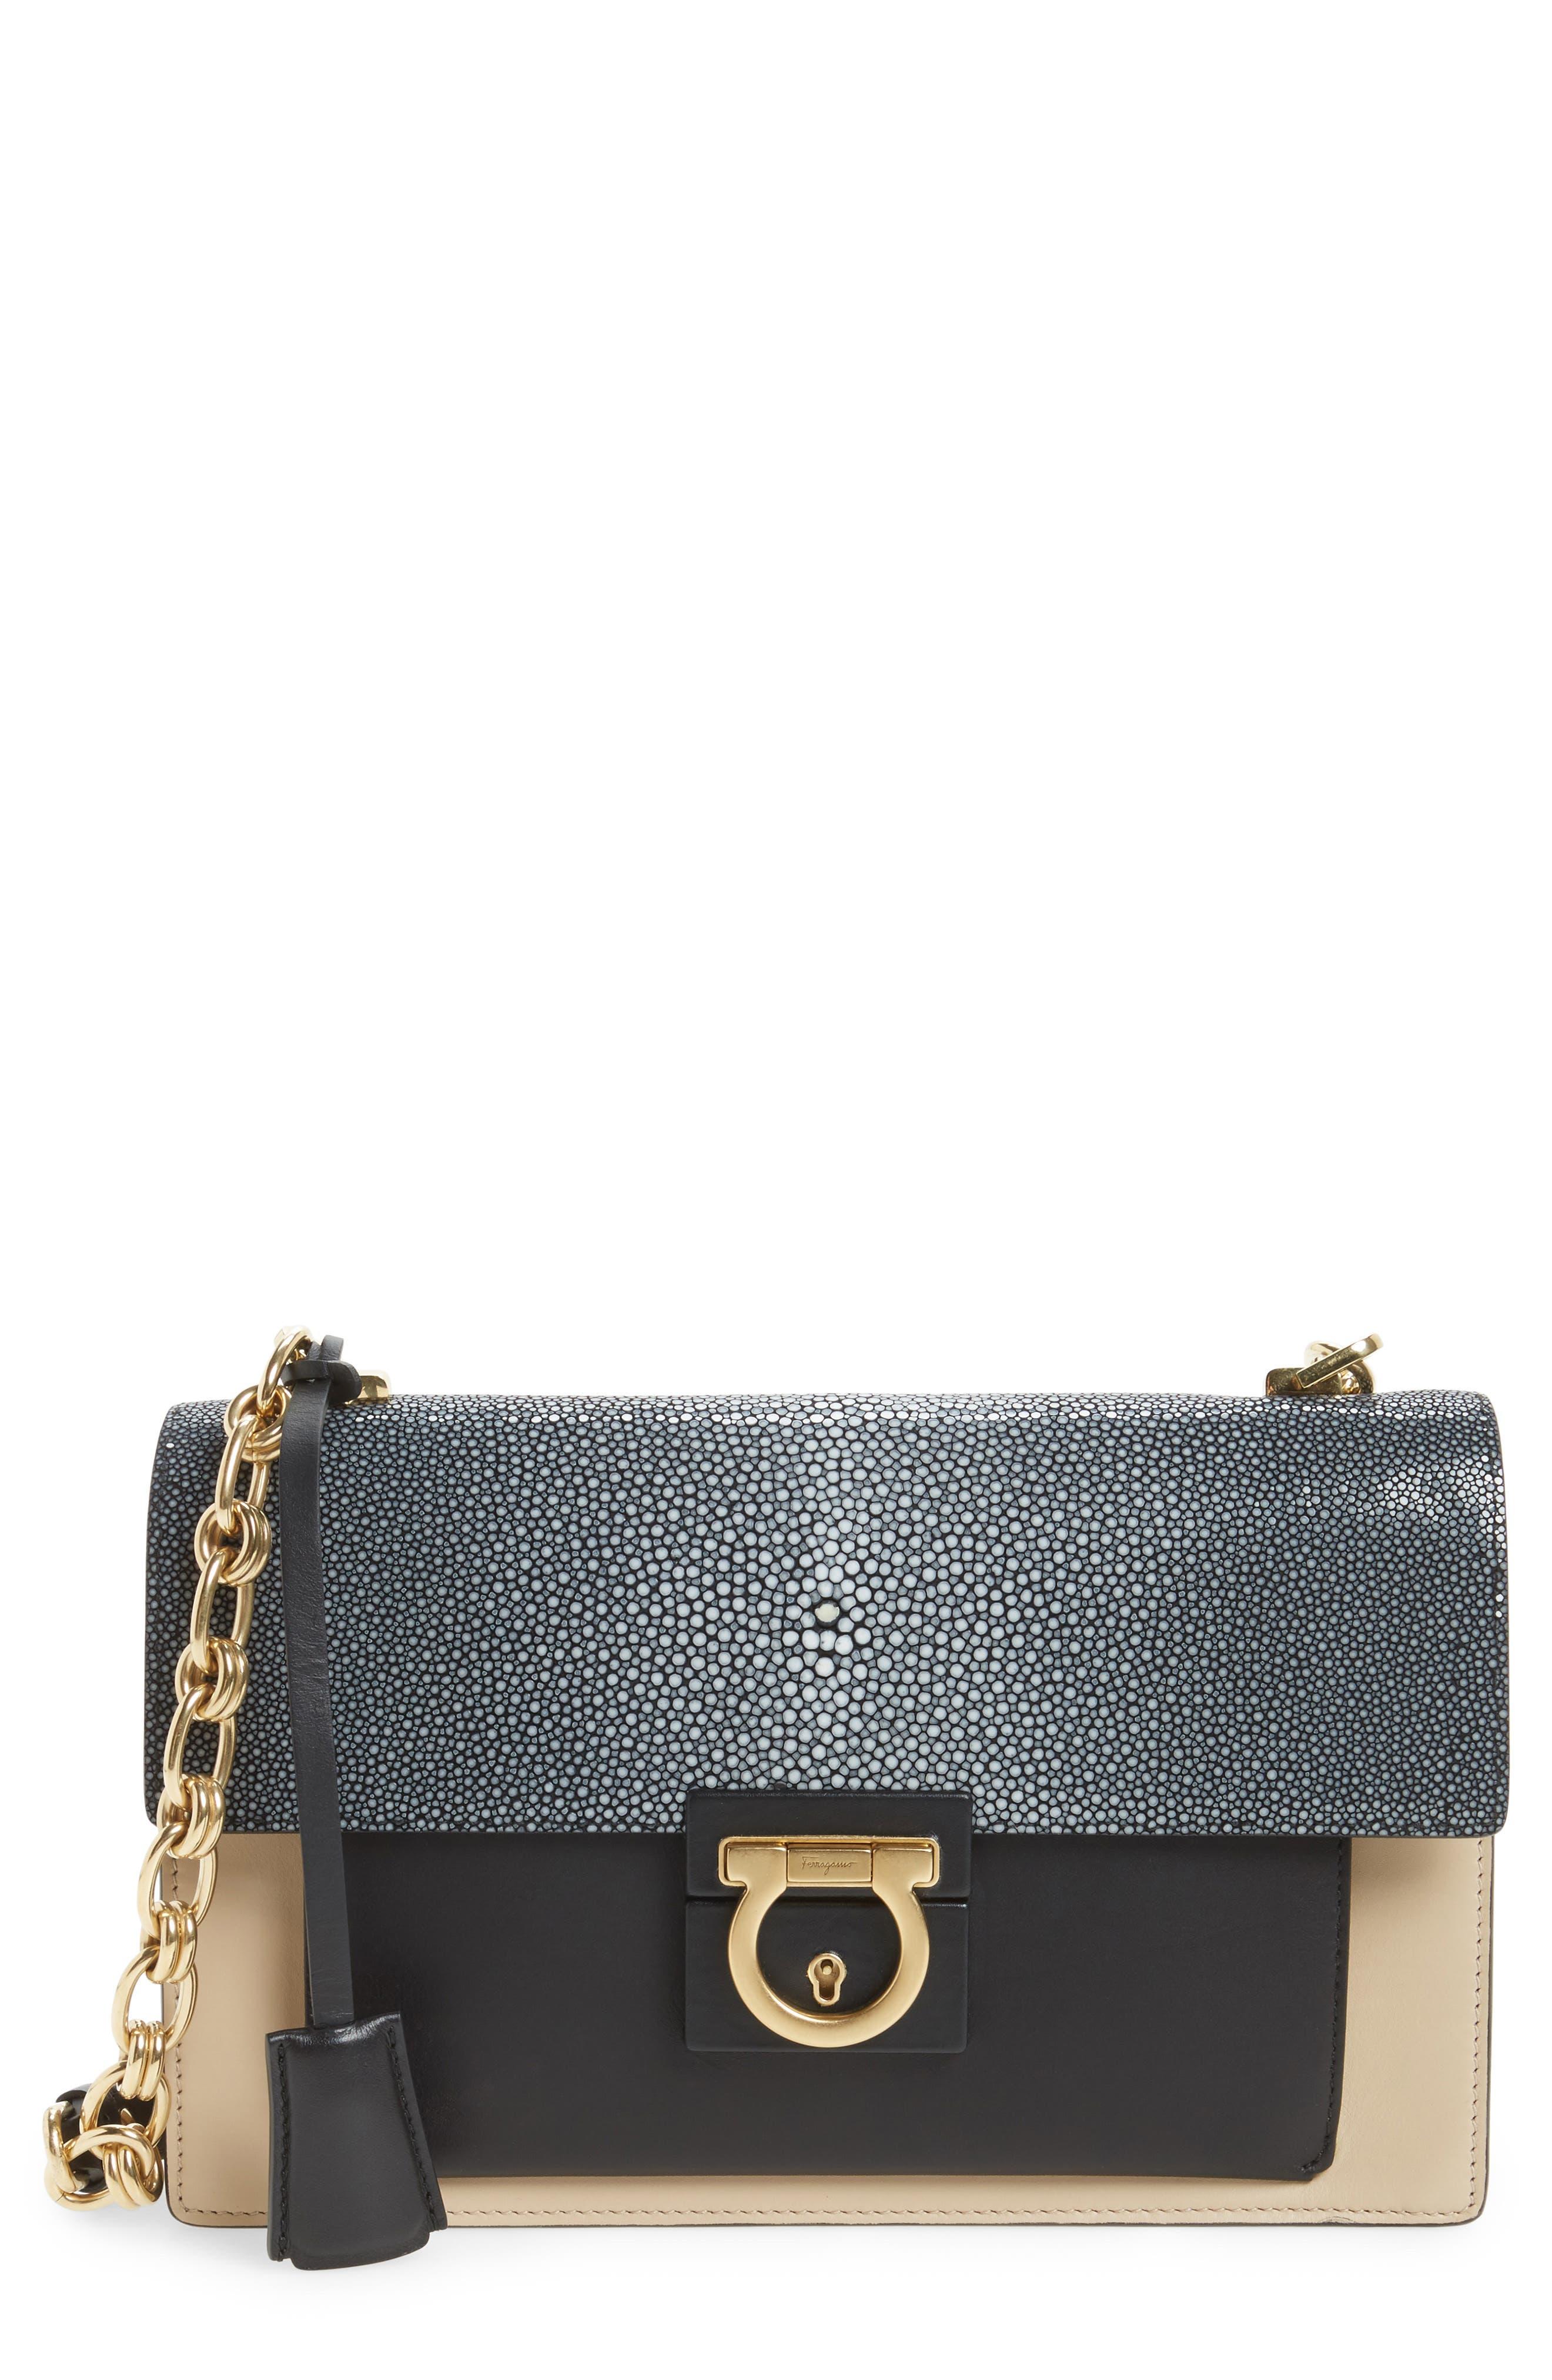 SALVATORE FERRAGAMO,                             Stingray Leather Shoulder Bag,                             Main thumbnail 1, color,                             974